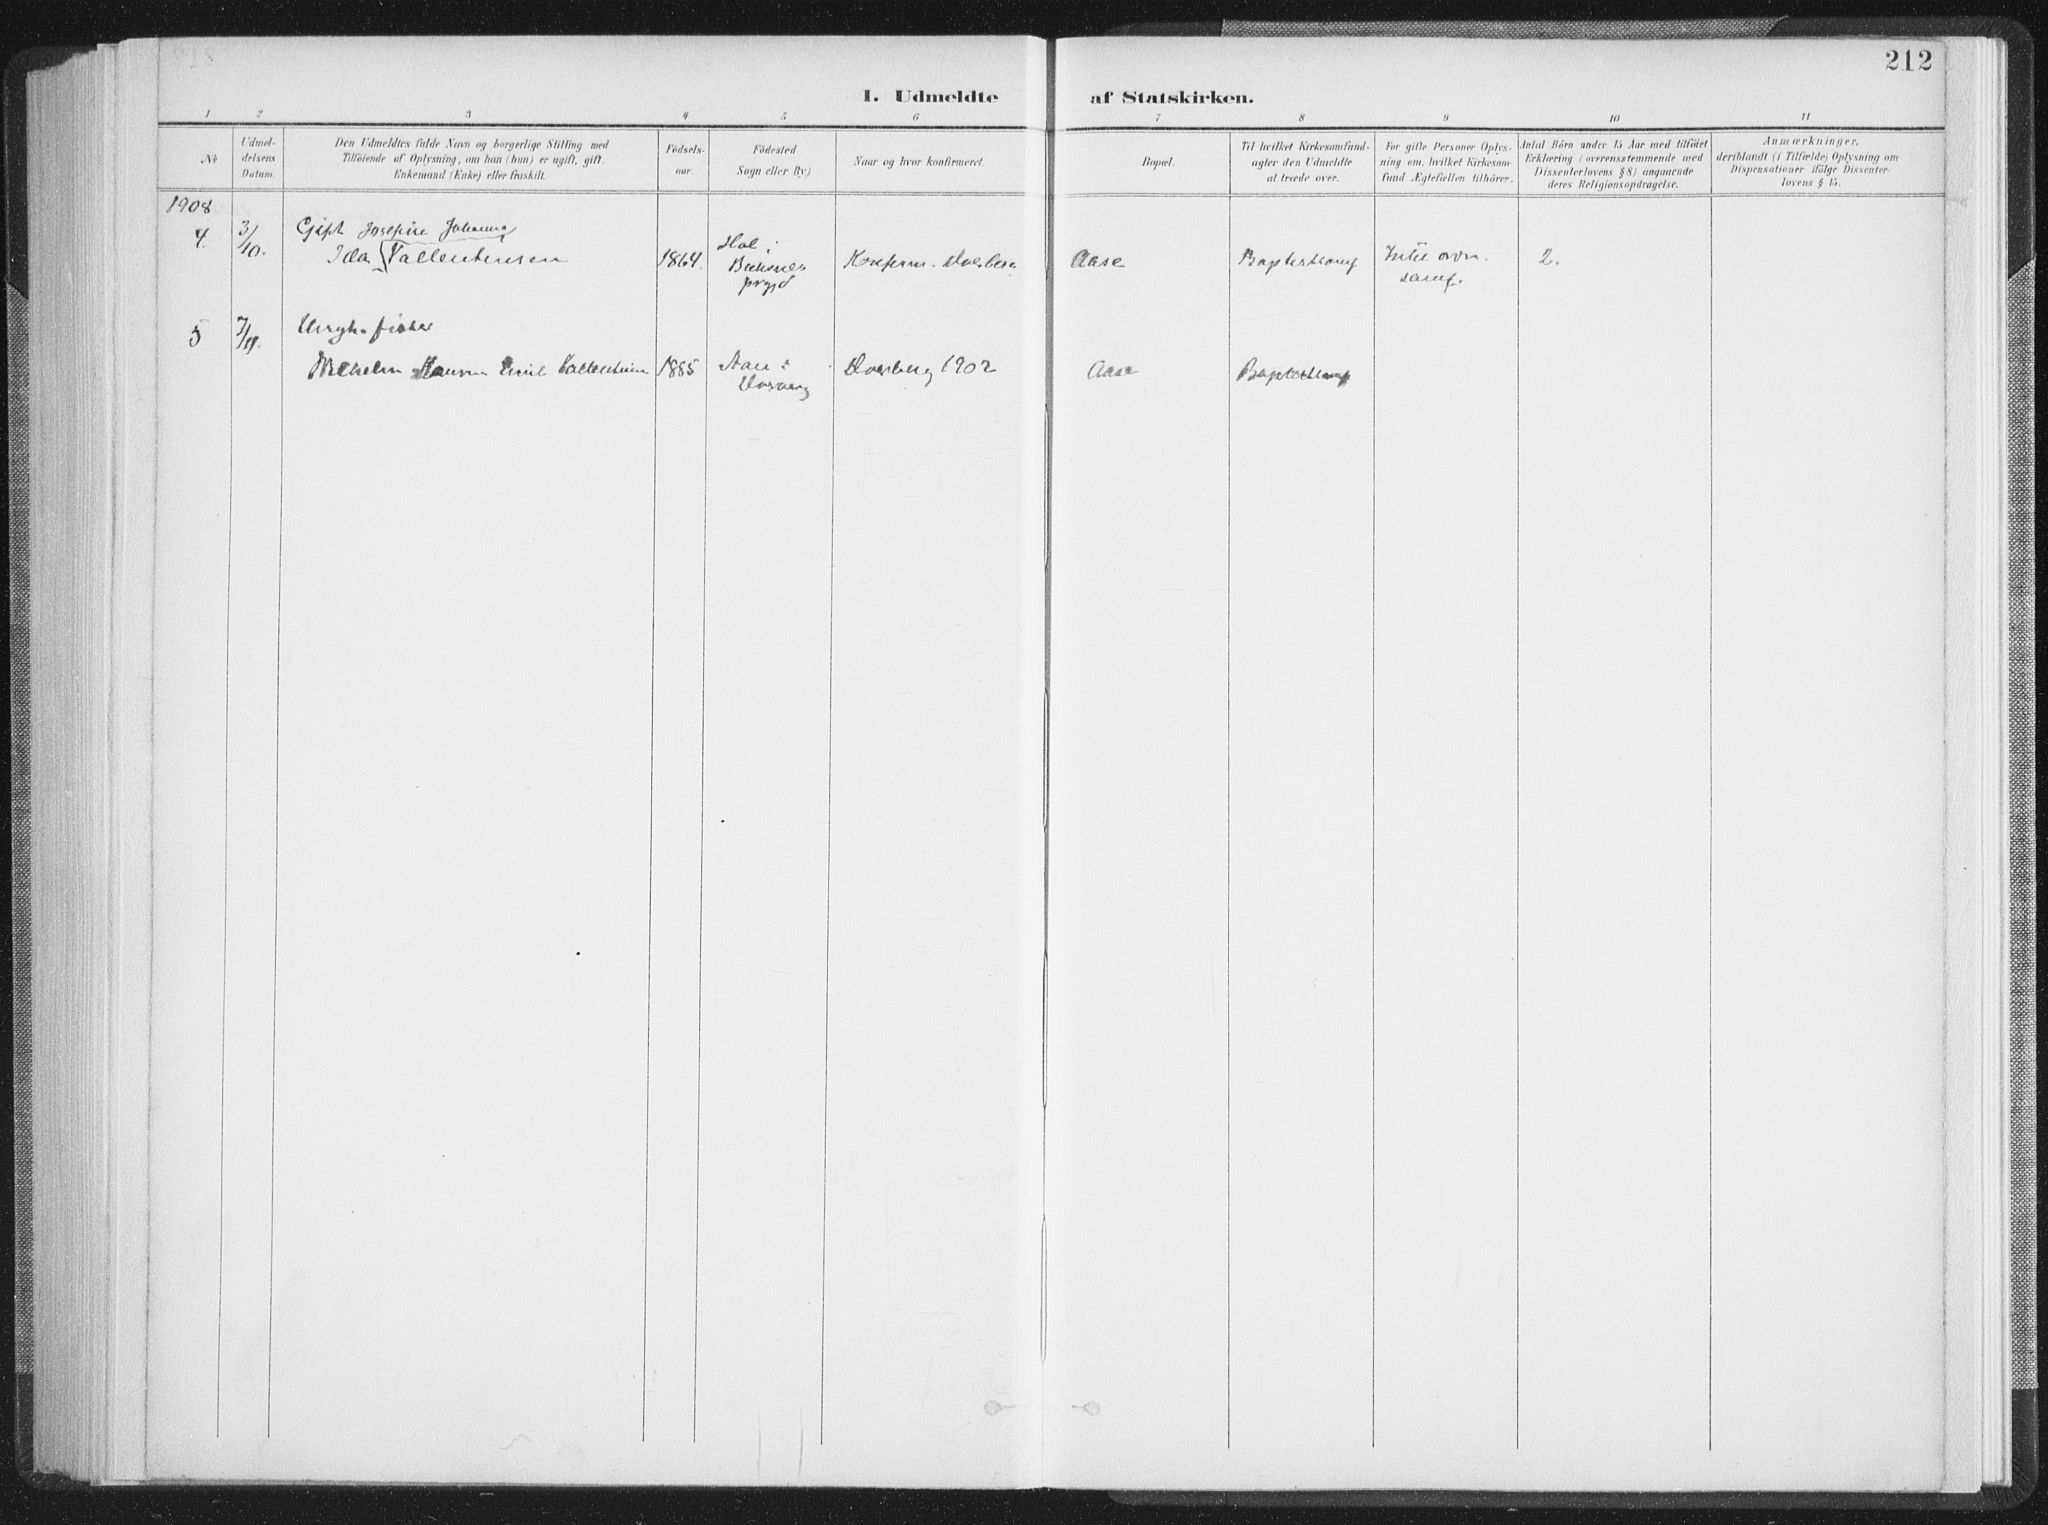 SAT, Ministerialprotokoller, klokkerbøker og fødselsregistre - Nordland, 897/L1400: Ministerialbok nr. 897A07, 1897-1908, s. 212